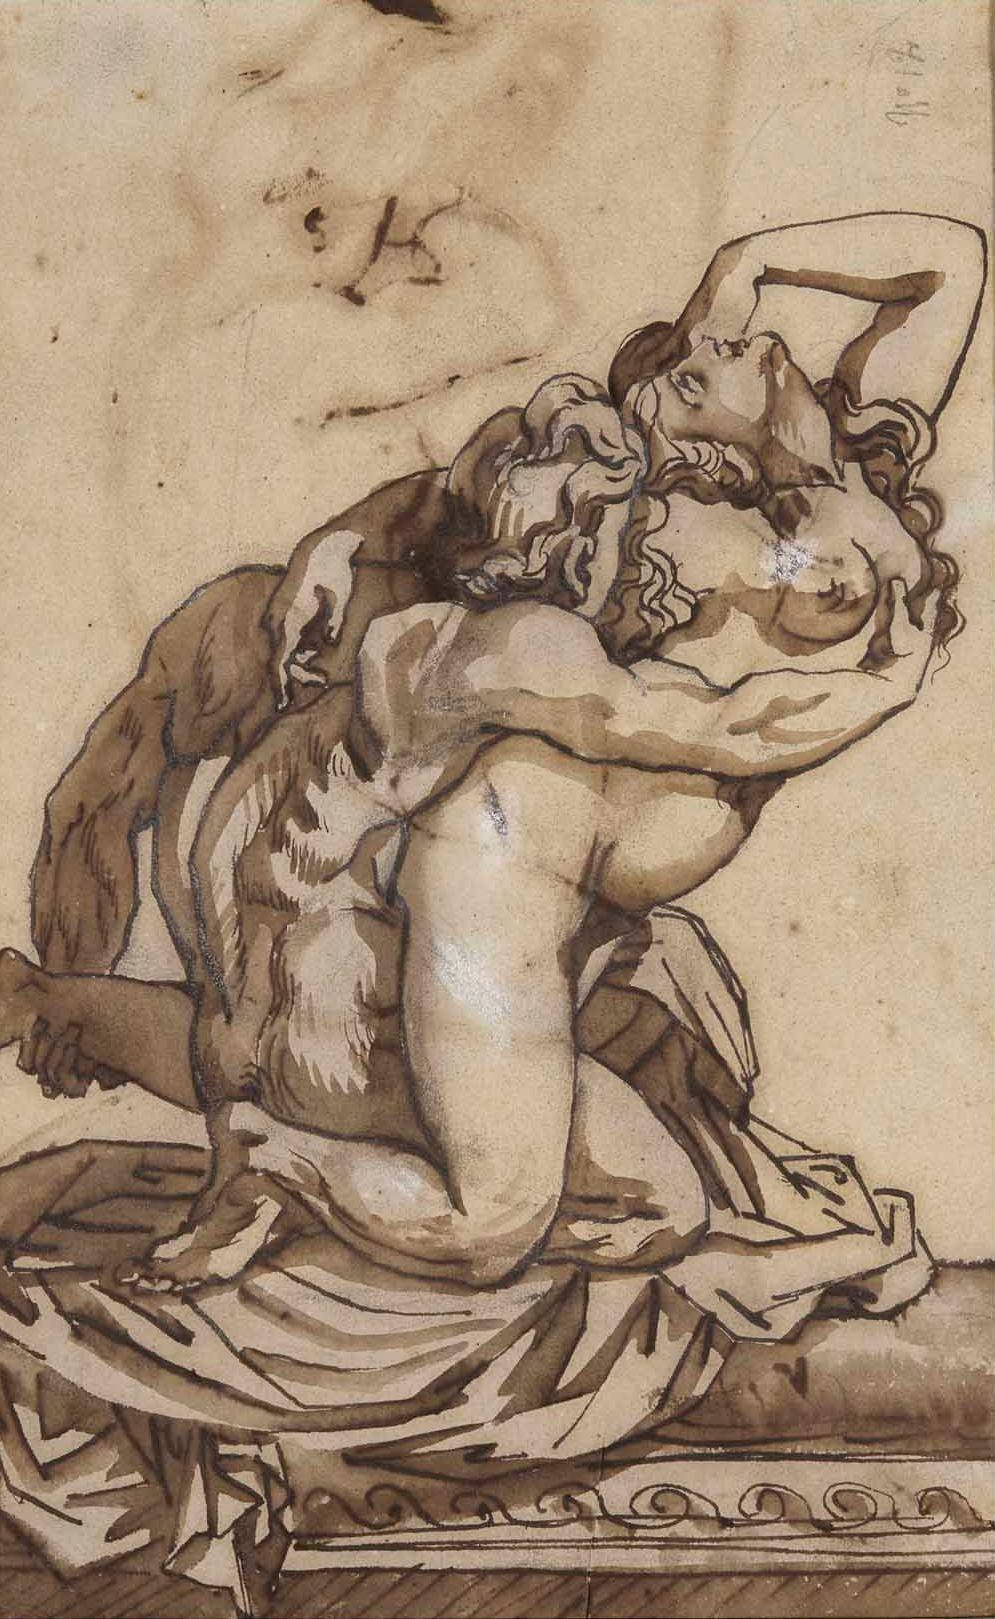 Théodore Géricault. Nude man and woman. Etude